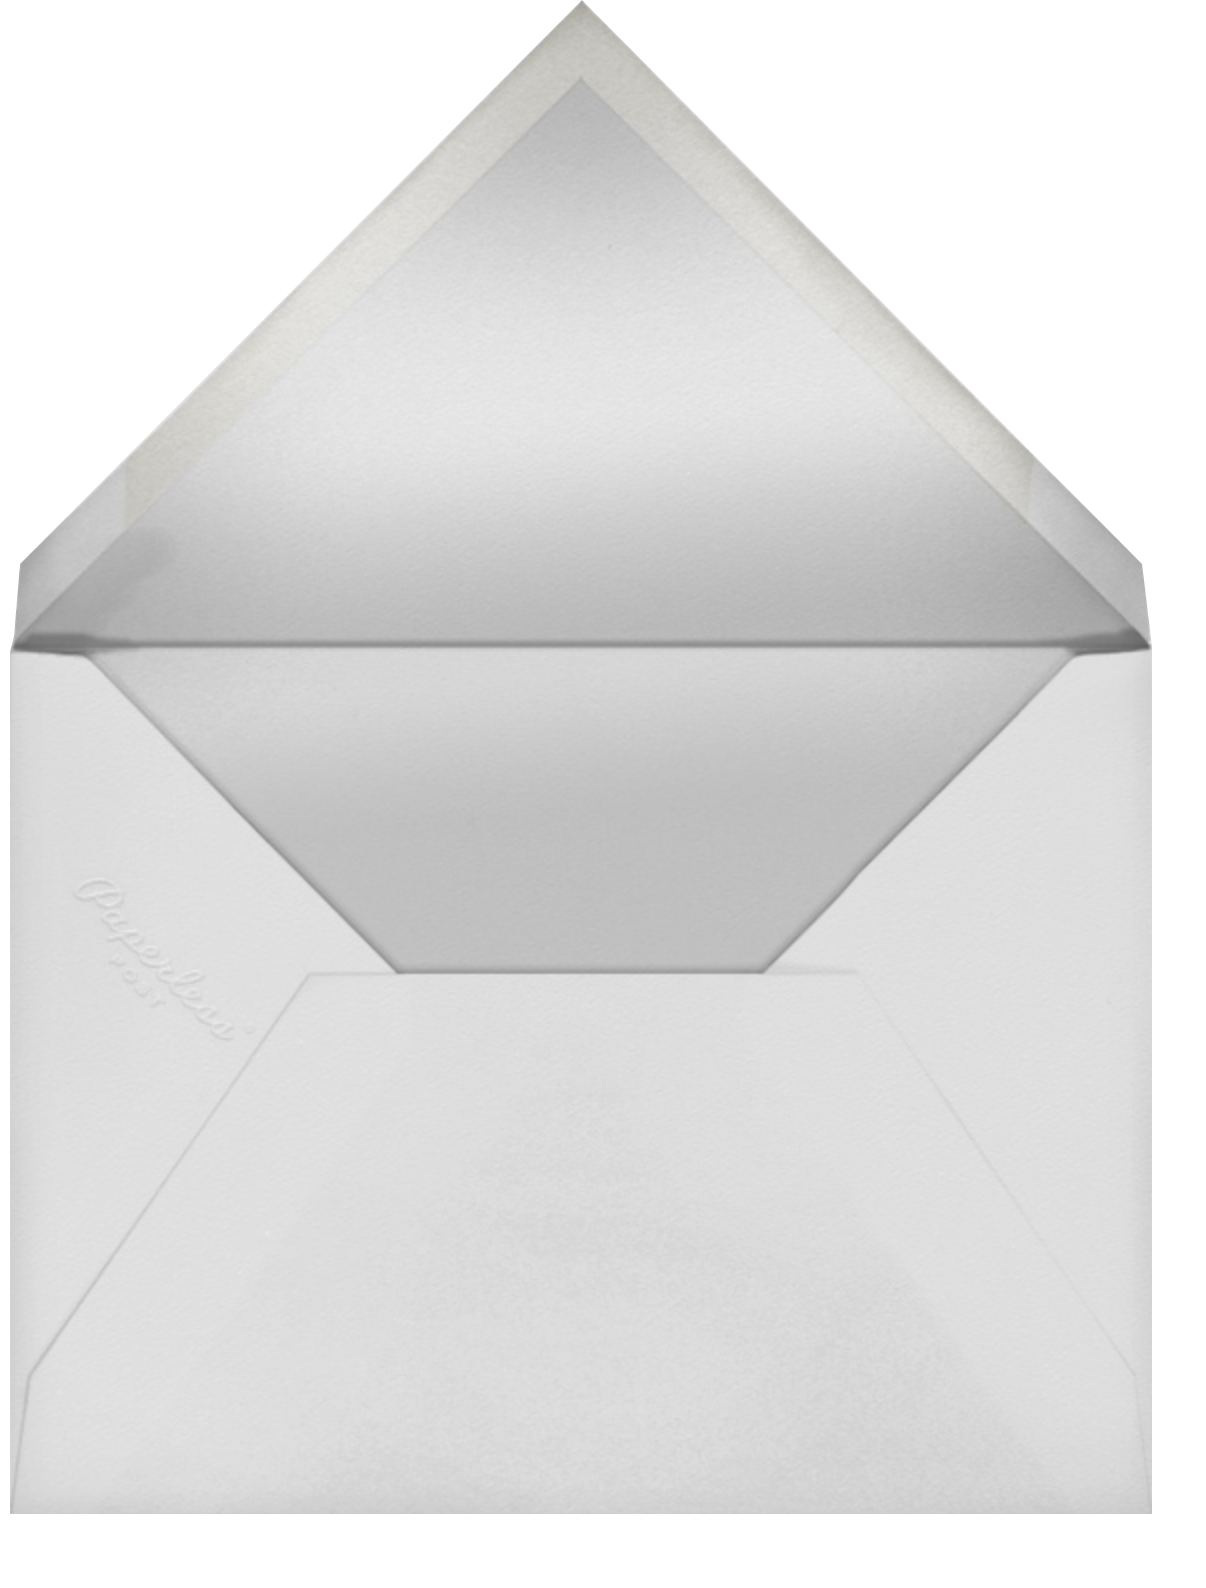 Royal Elephant (Menu) - Rifle Paper Co. - Menus - envelope back